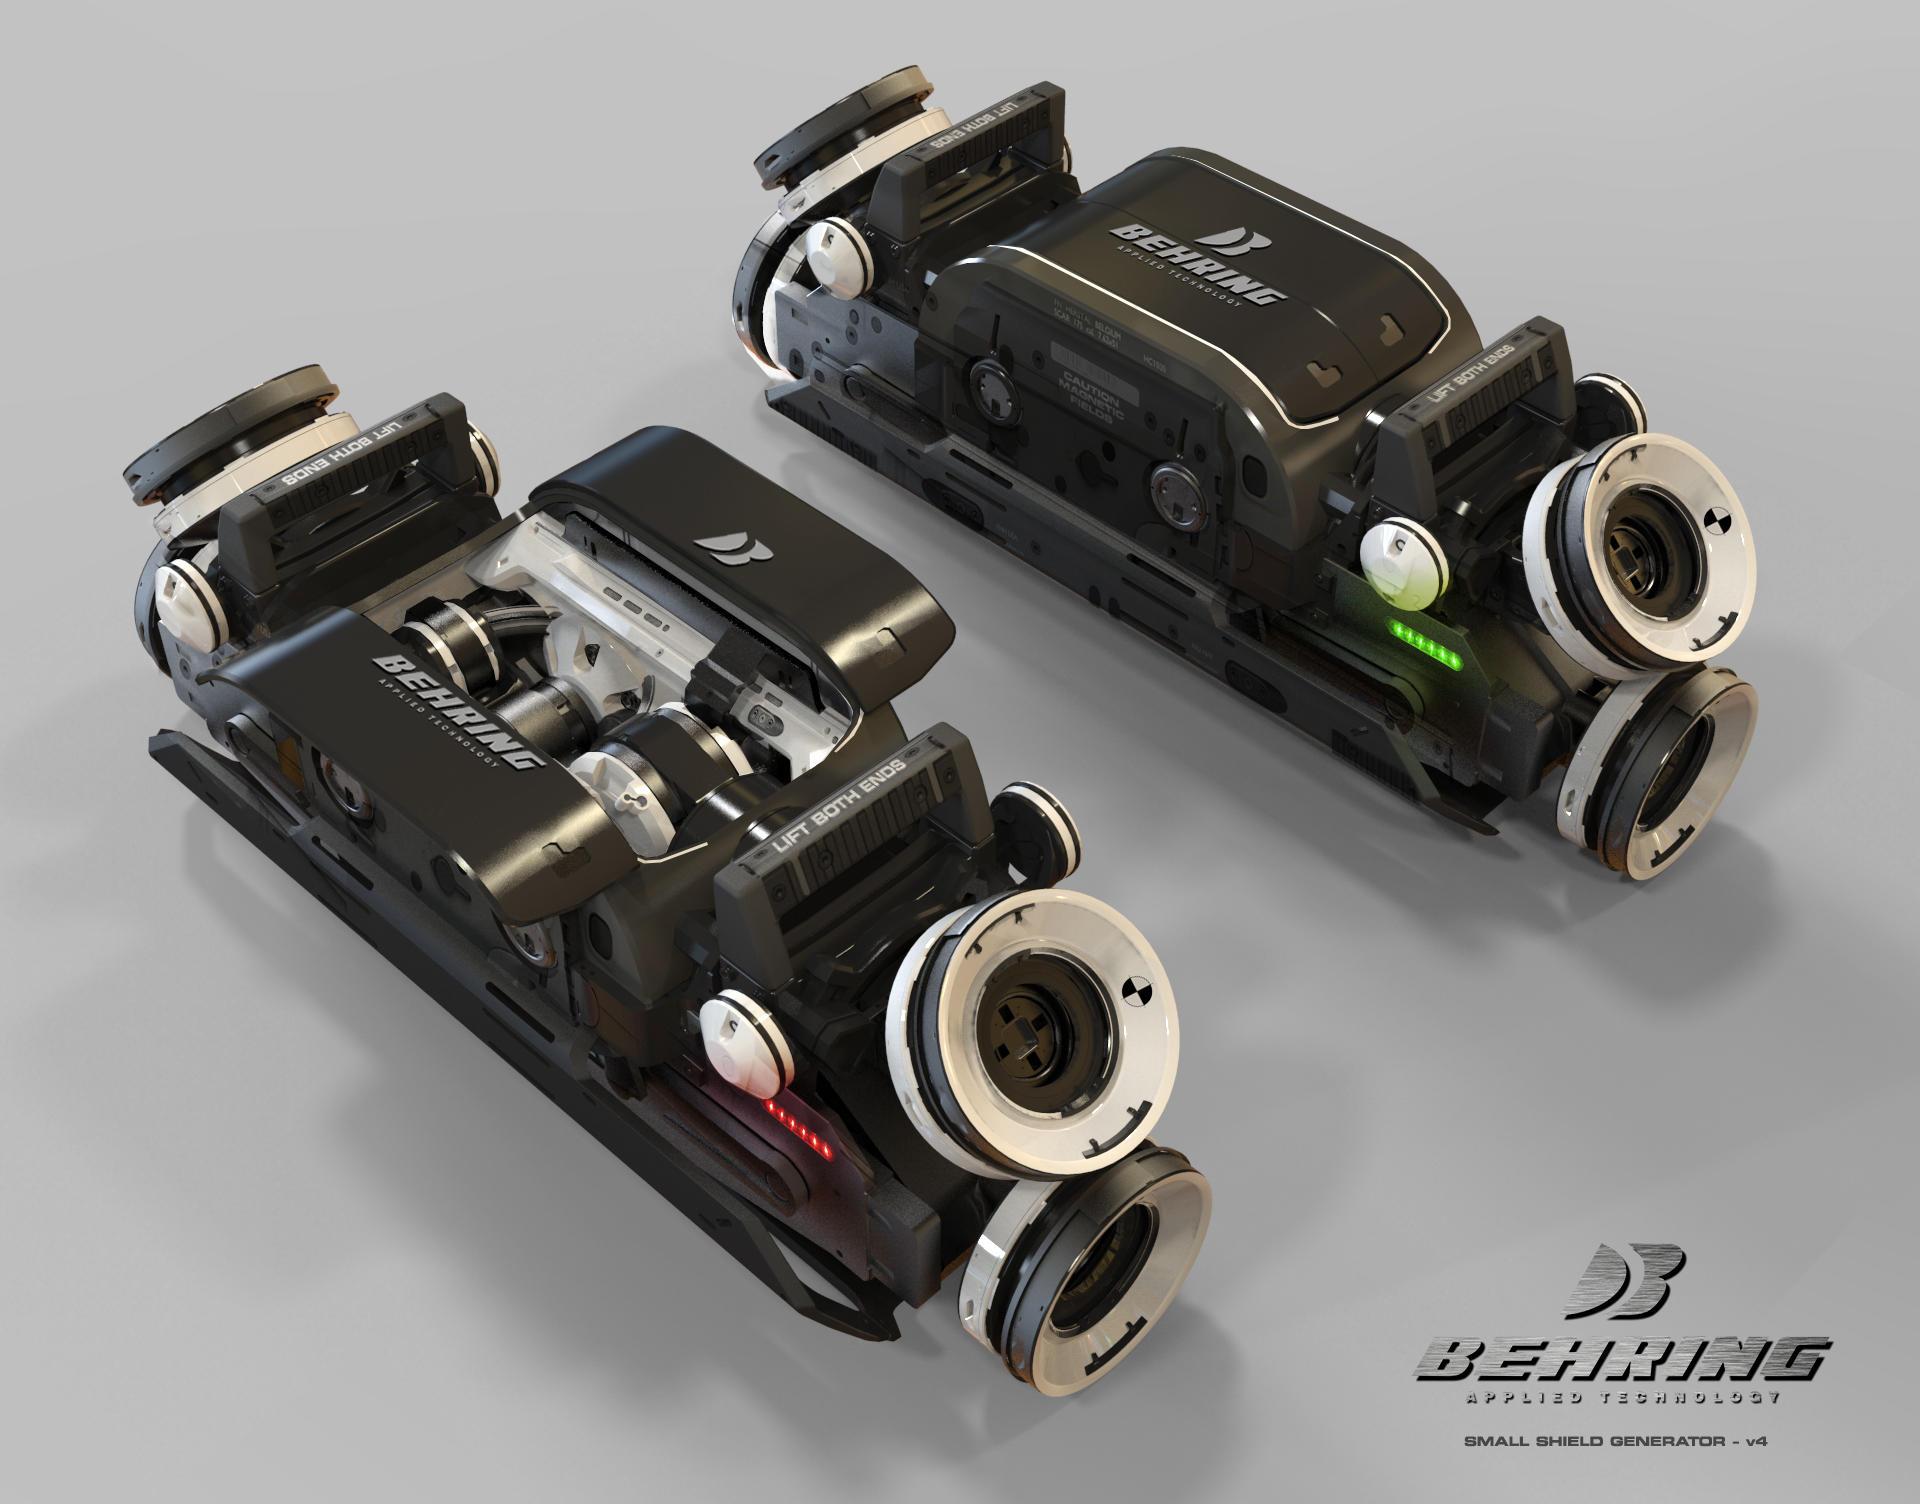 Small shield generator - Komponenty